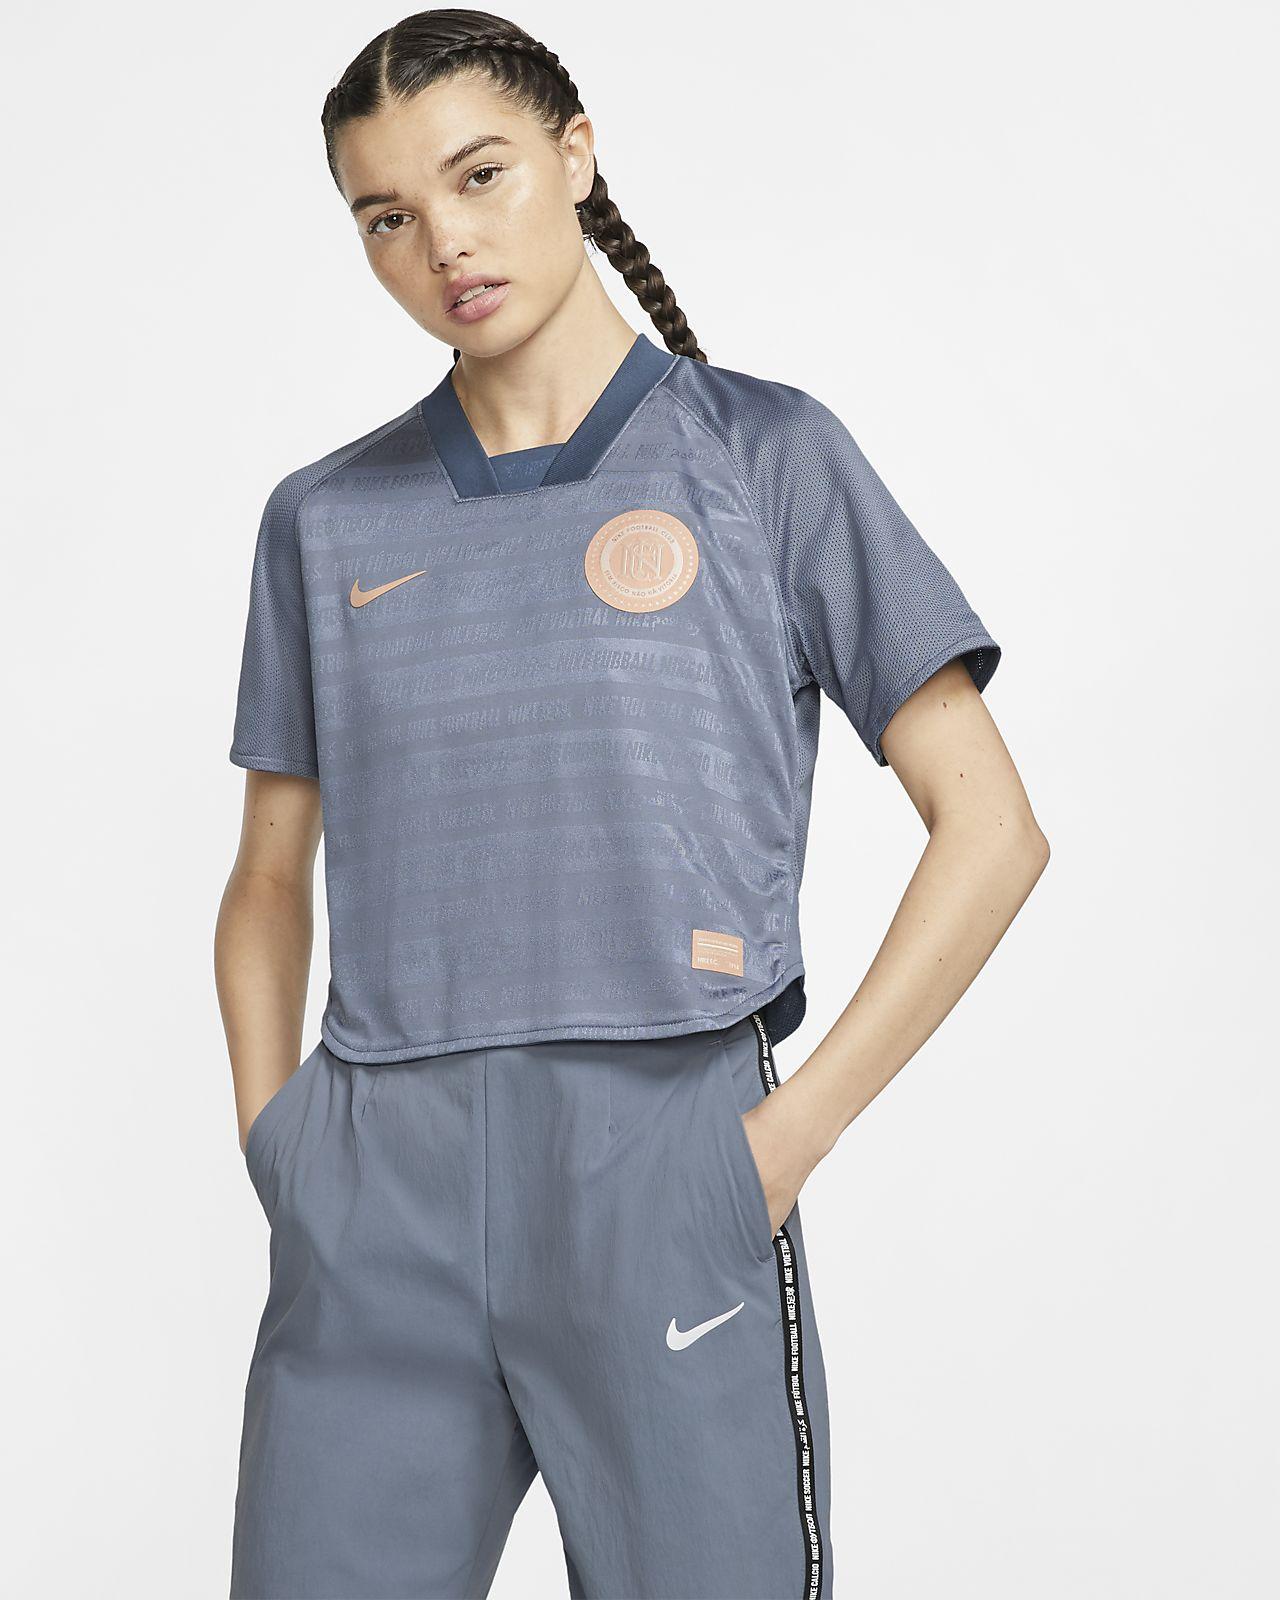 Prenda para la parte superior de fútbol de manga corta para mujer Nike F.C. Dri-FIT